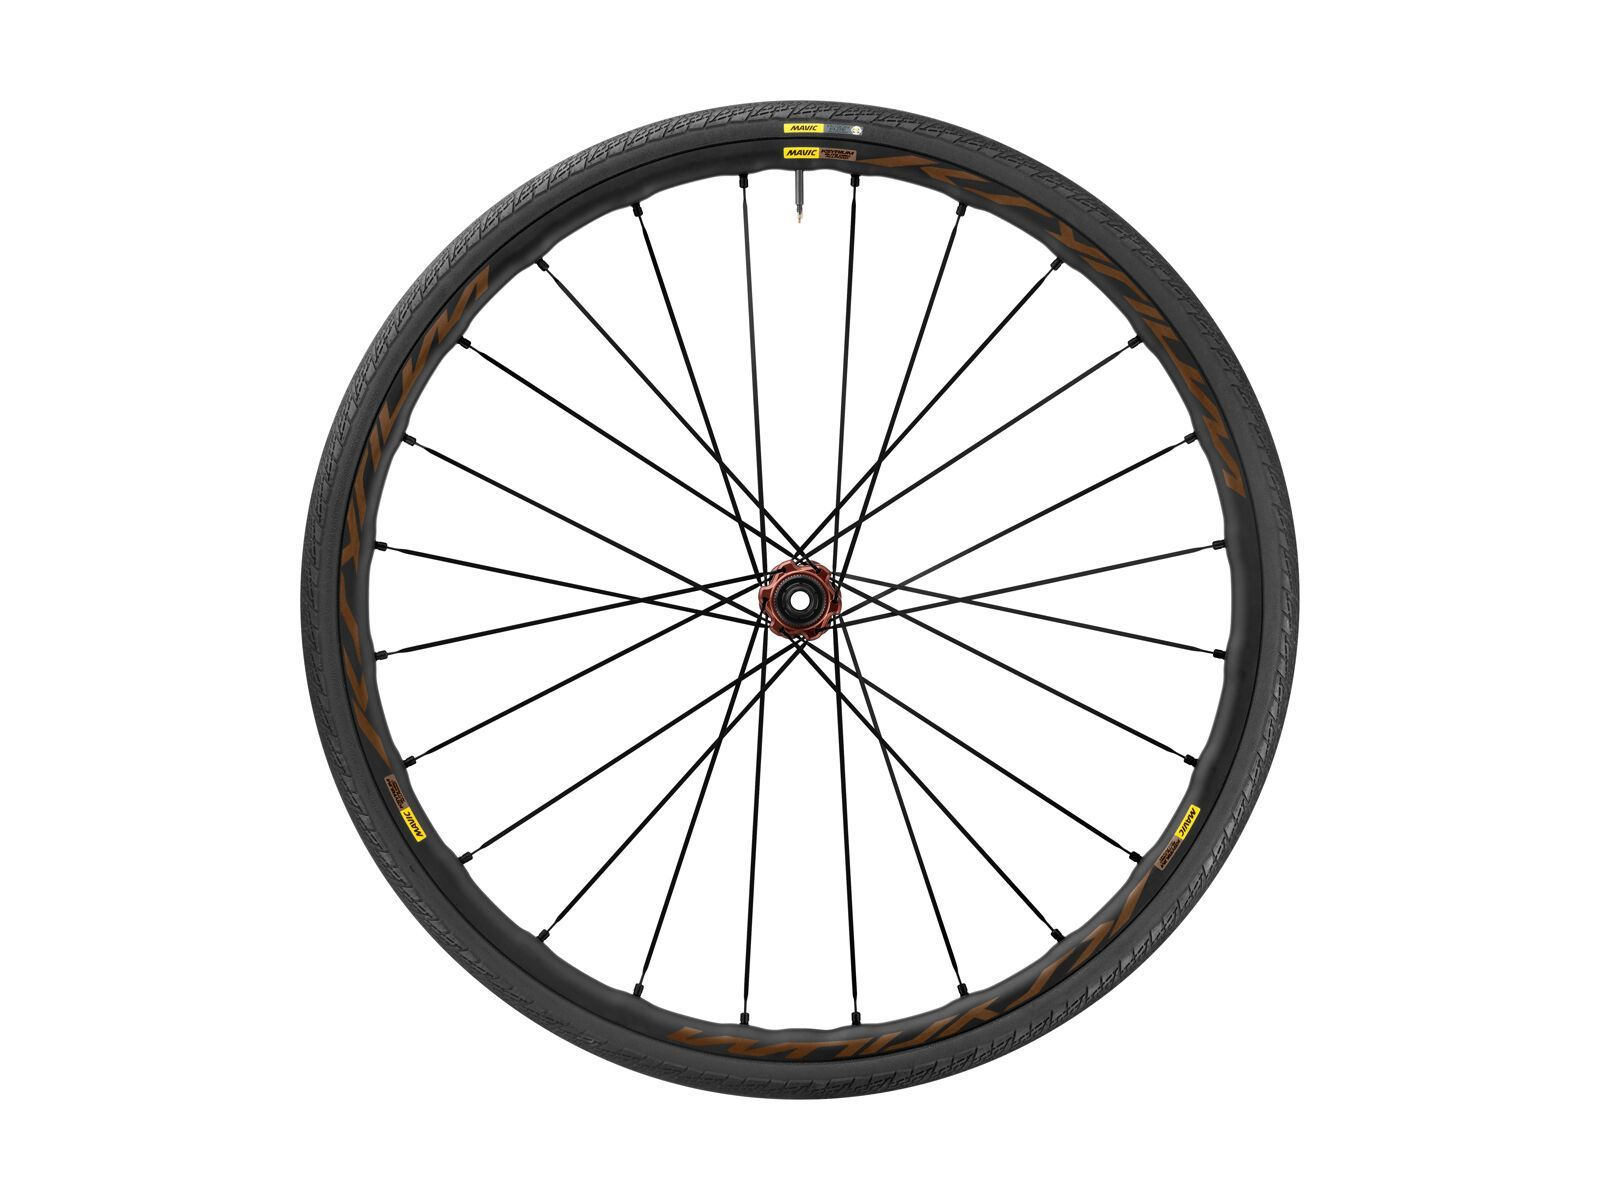 Mavic Ksyrium Elite Disc Allroad Center-Lock - 12x100 mm, inkl. 28C Reifen black 12x100 F5990128